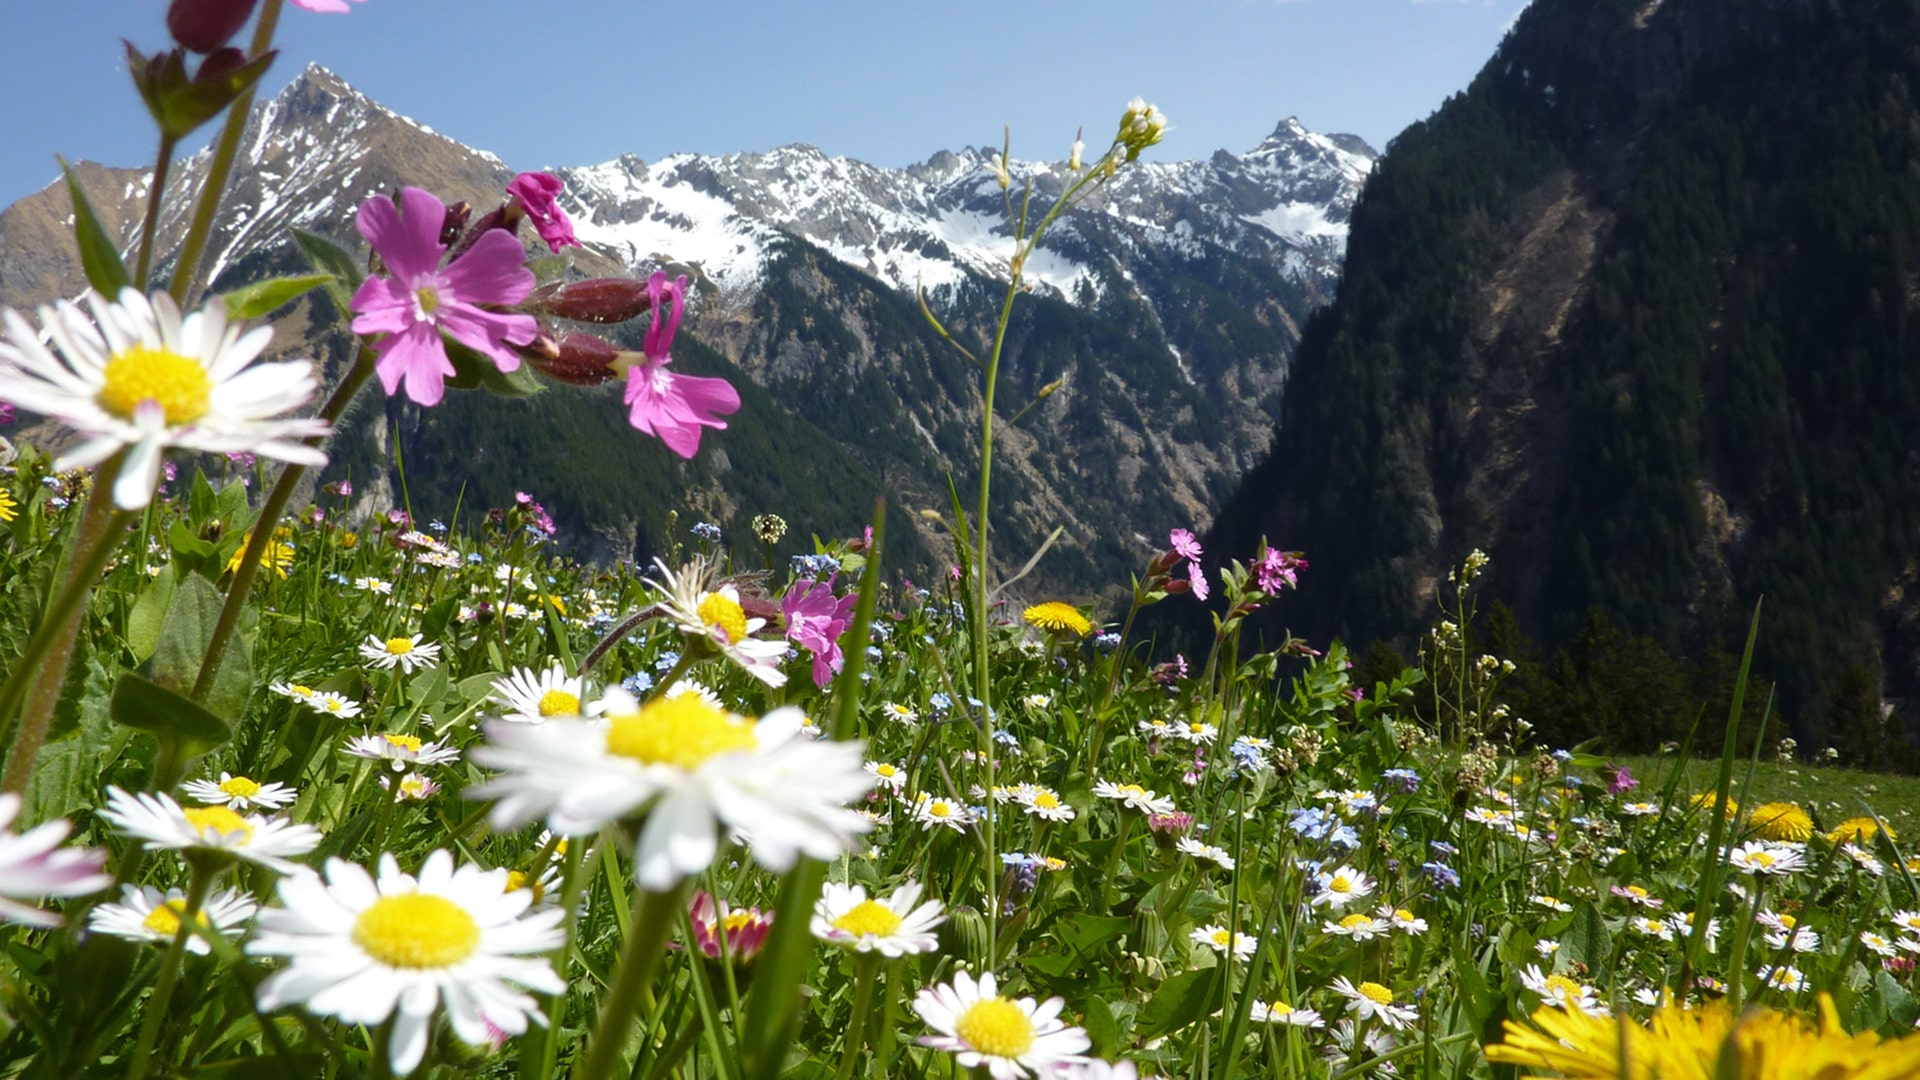 Blumenwiese vor Bergpanorama-min